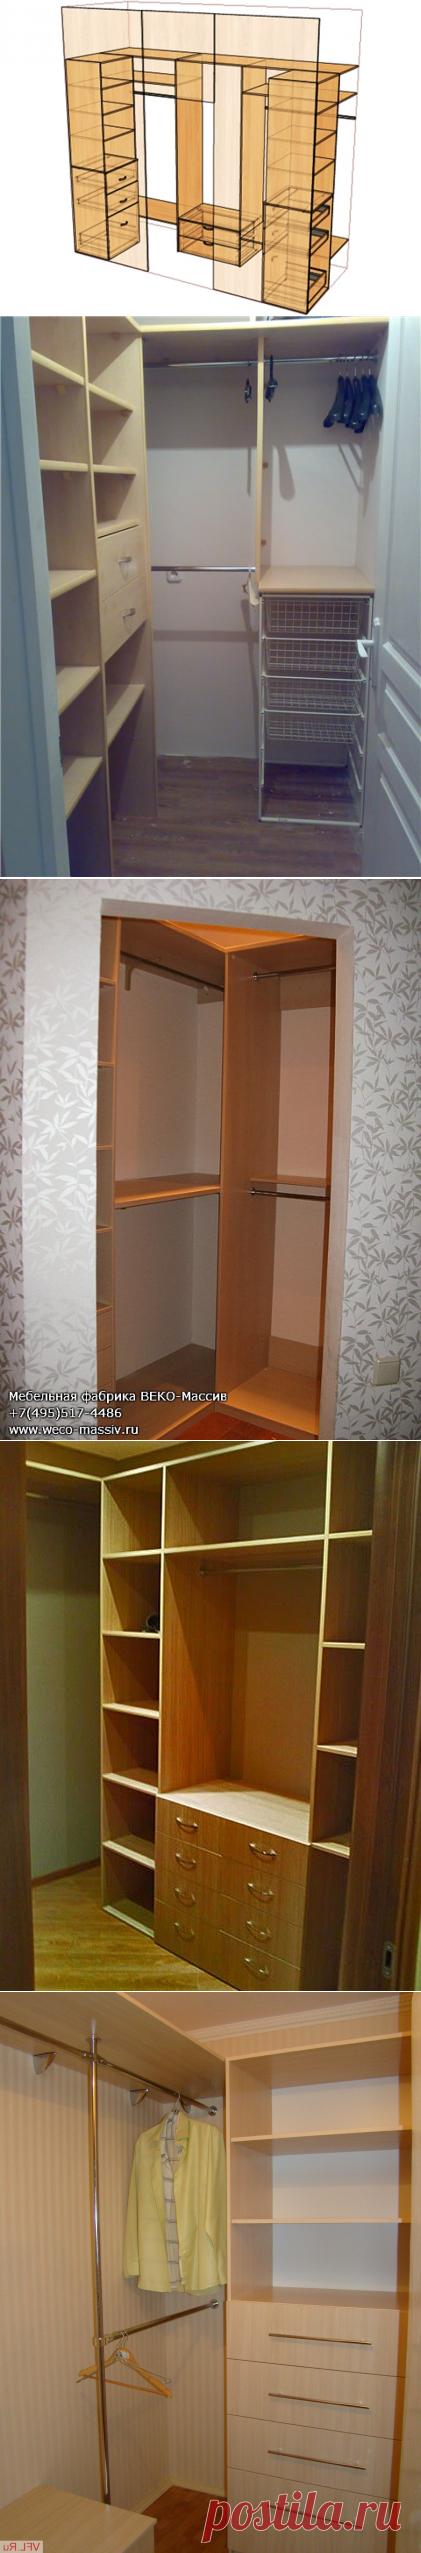 Как сделать фундамент под туалет на даче